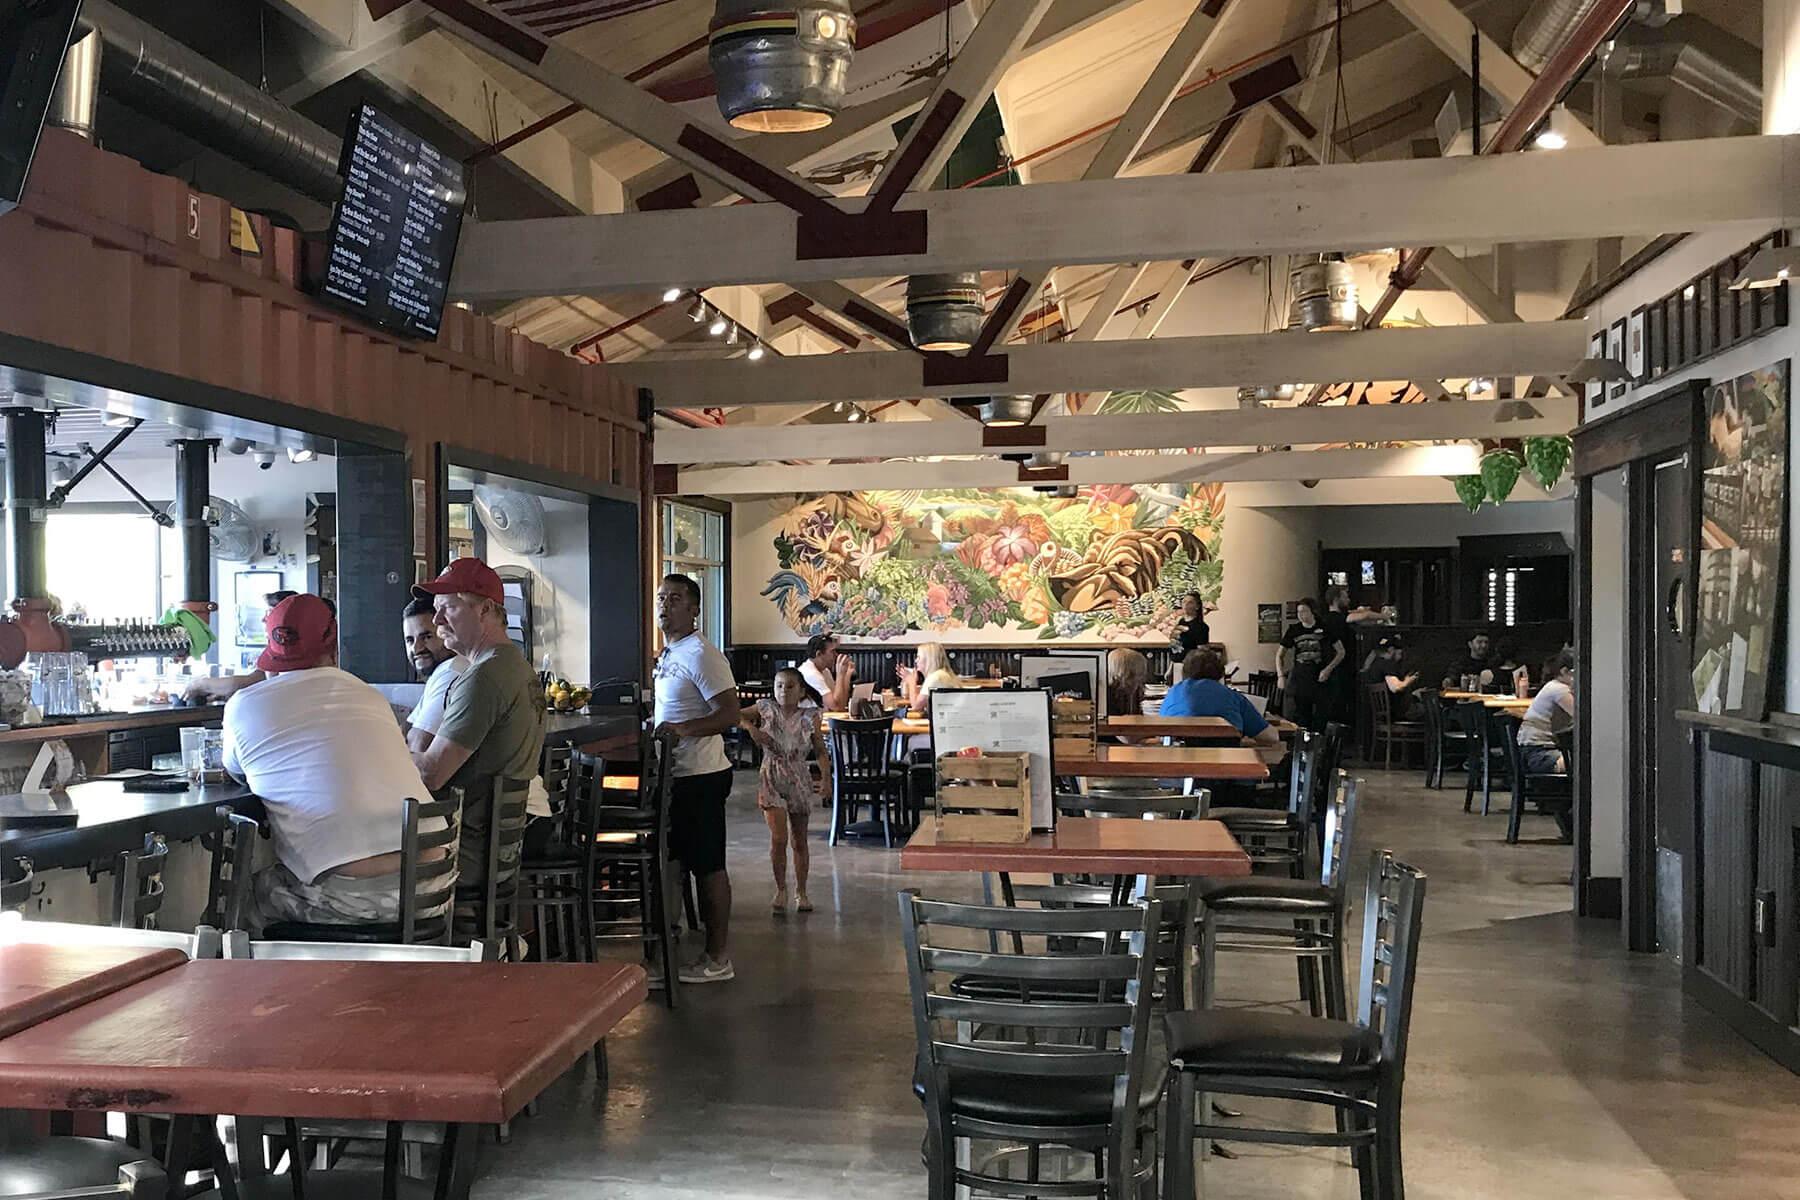 Inside the Bear Republic Brewing Company Pub & Restaurant in Rohnert Park, California